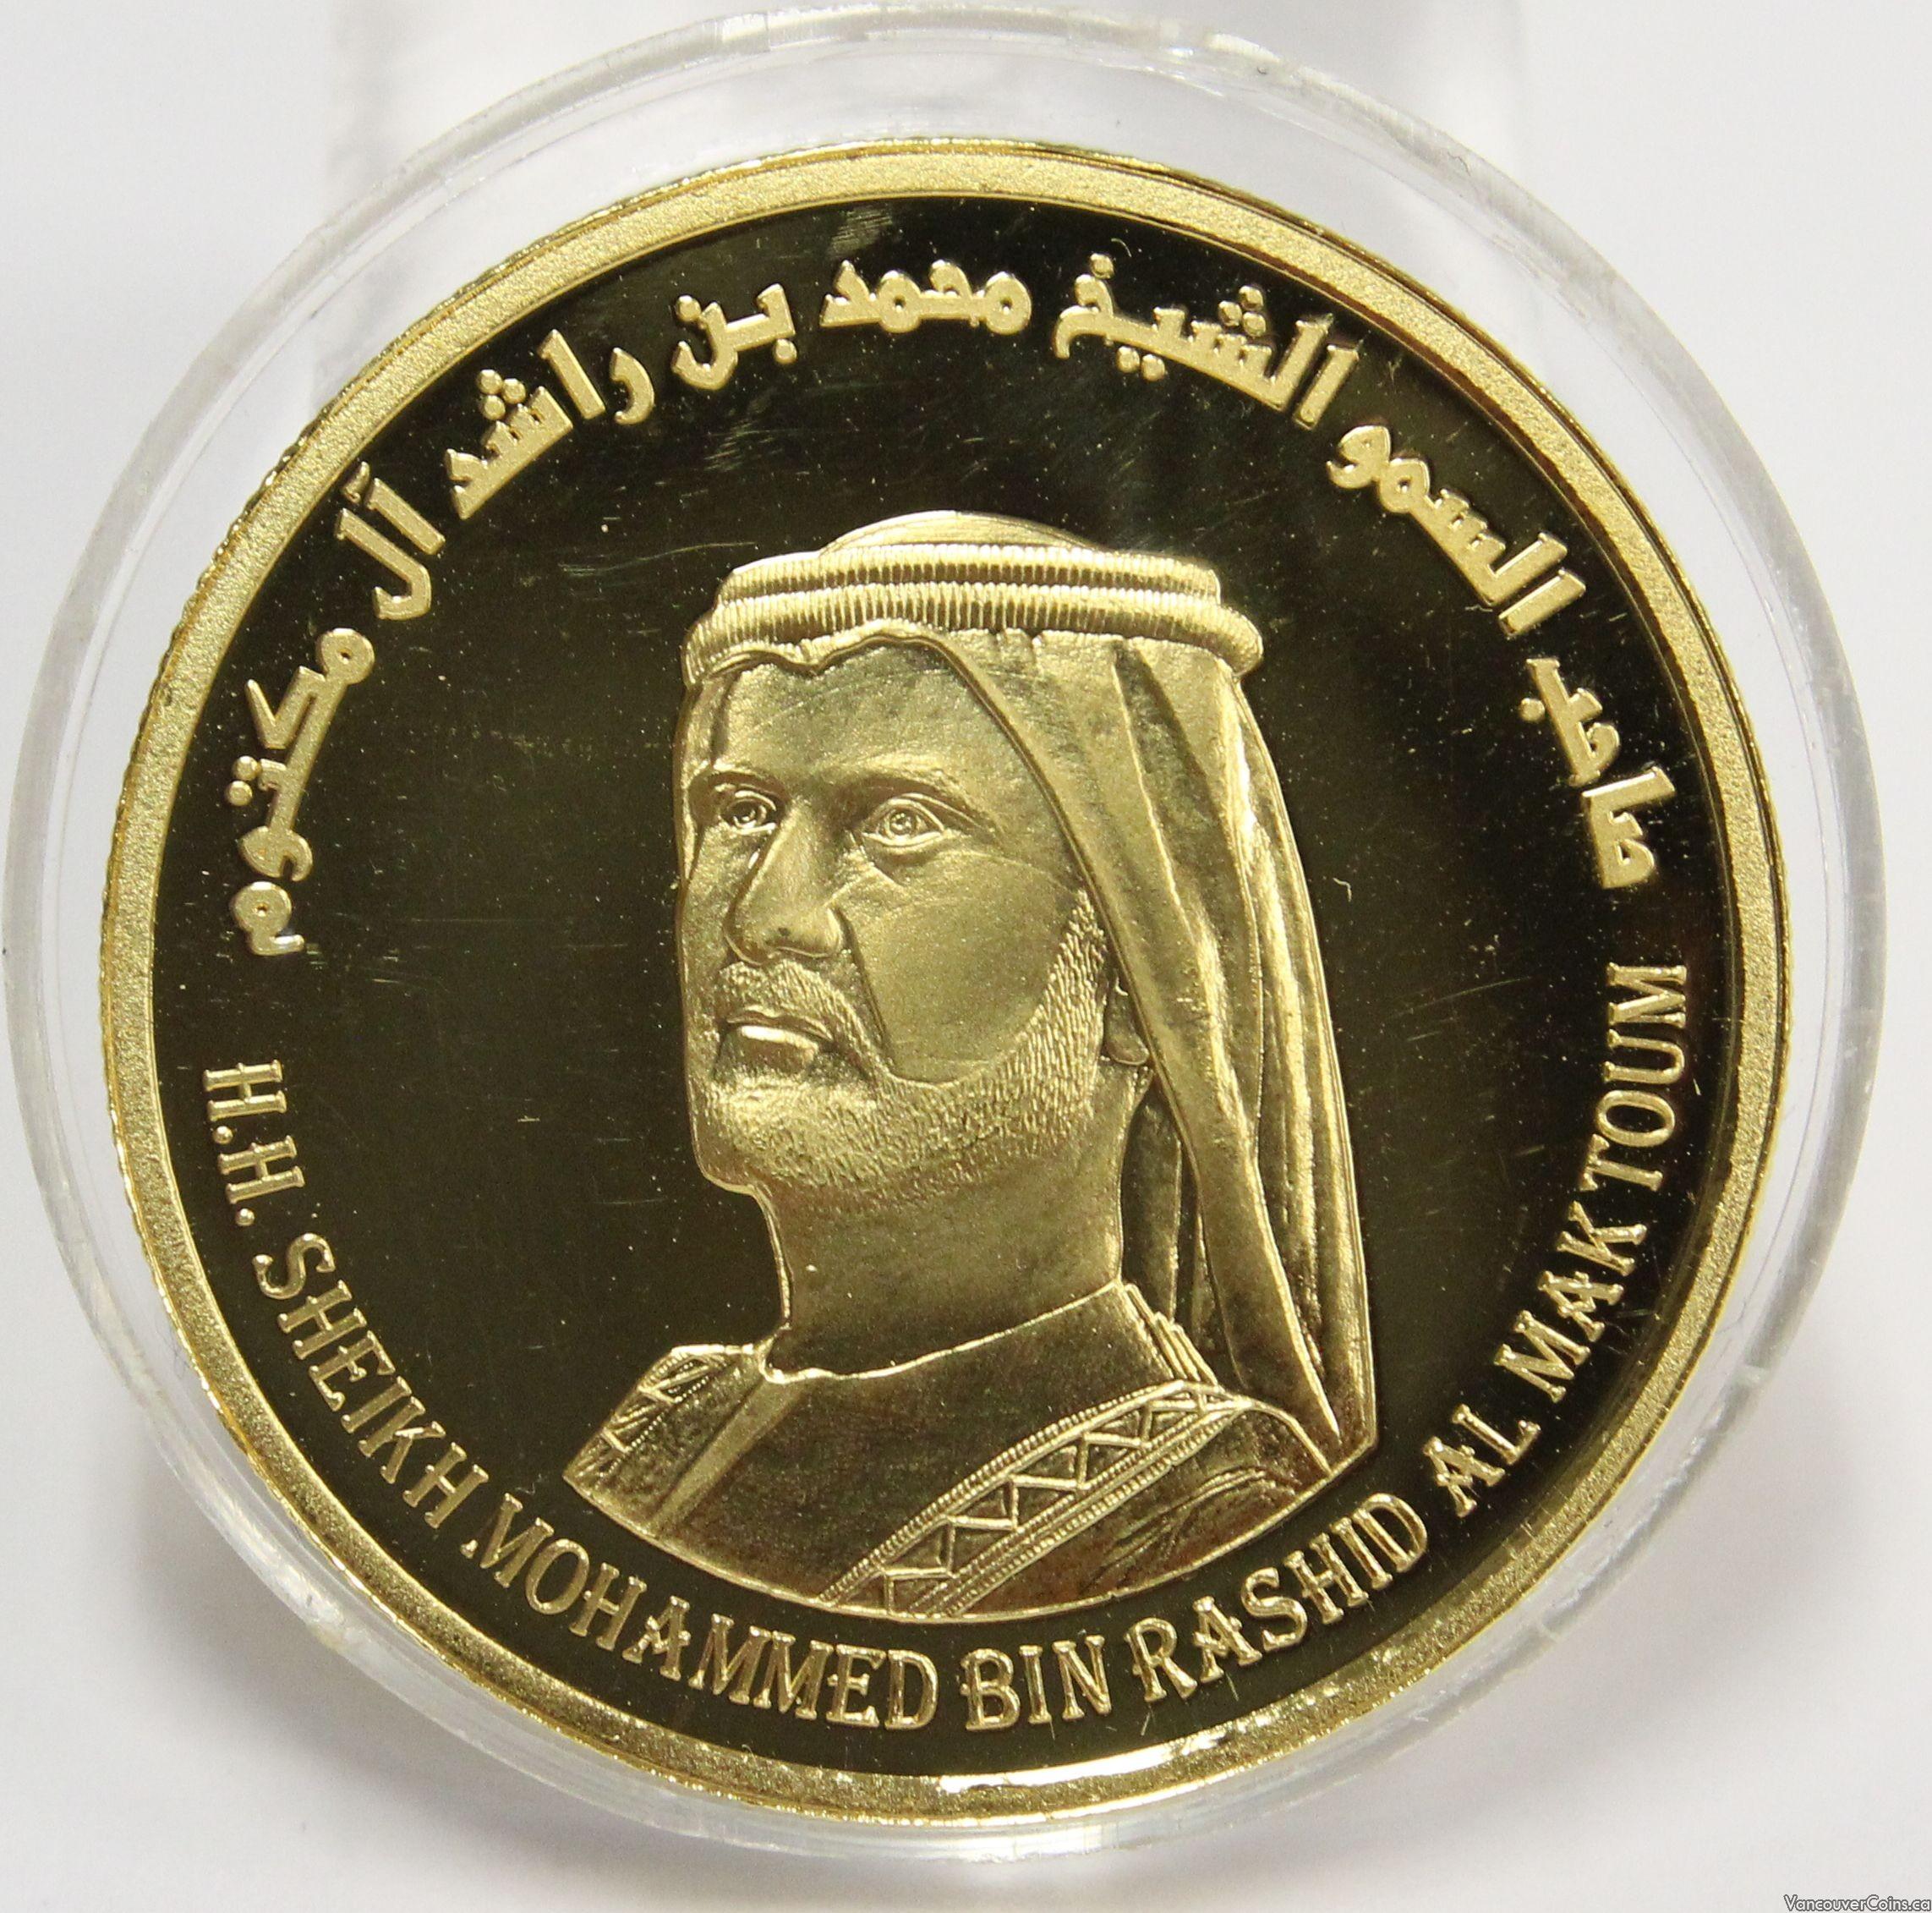 2009 Dubai 1 ounce 9999 gold coin Sheikh Mohammed bin Rashid Al Maktoum